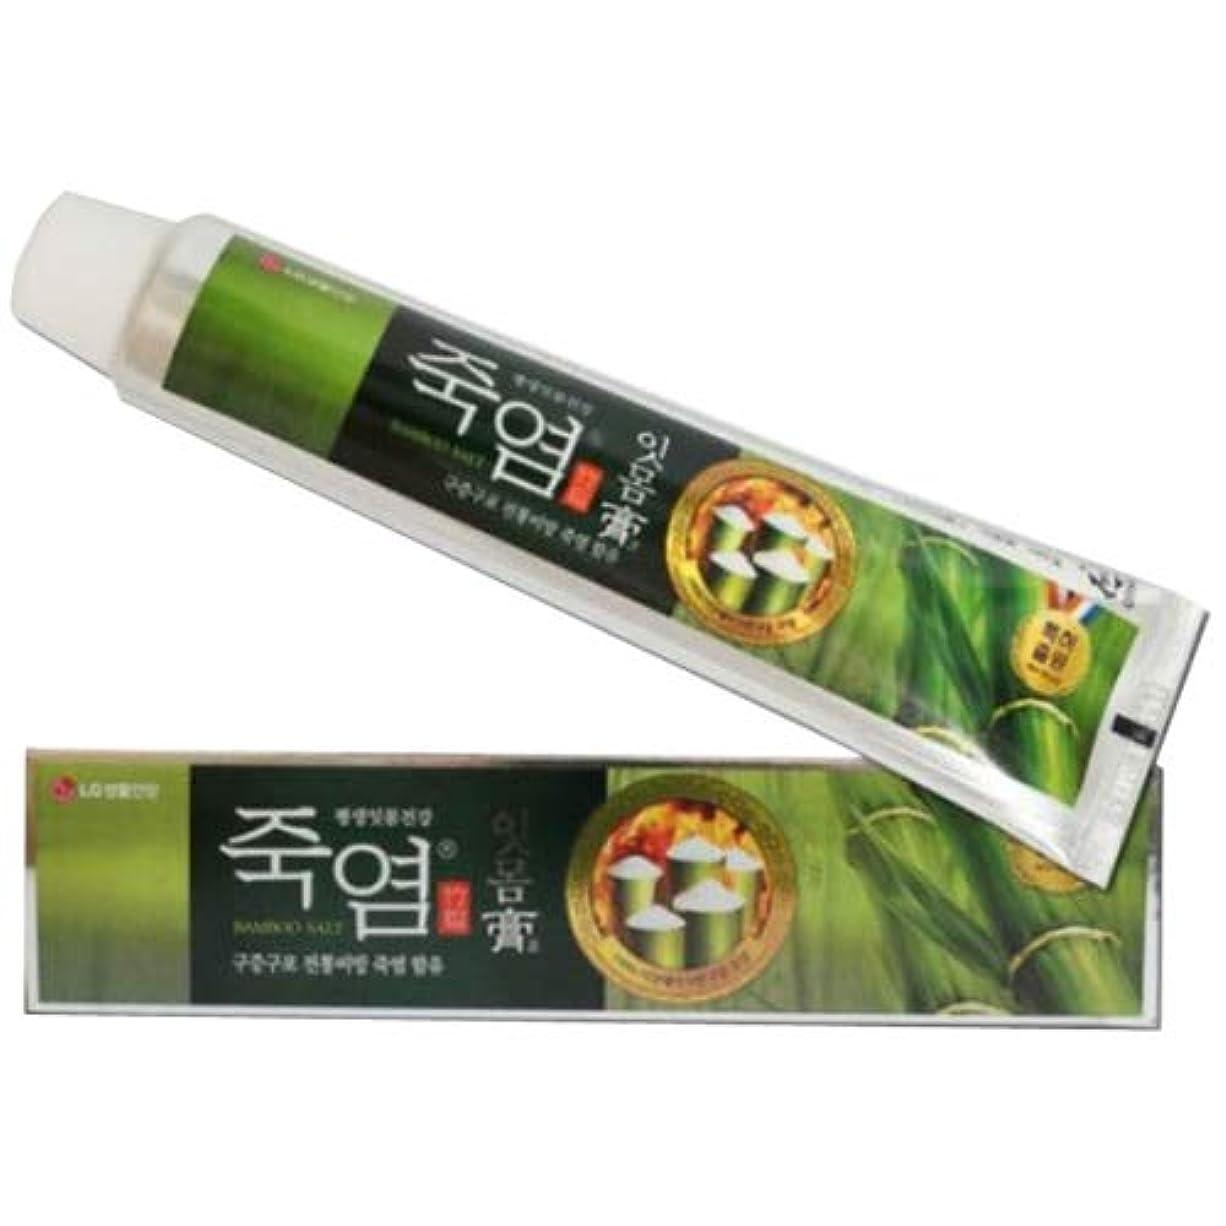 LG生活健康 竹塩歯磨き粉 (歯康膏:ウンガンゴ)(120gx3個) 歯肉炎の予防 歯茎の出血予防